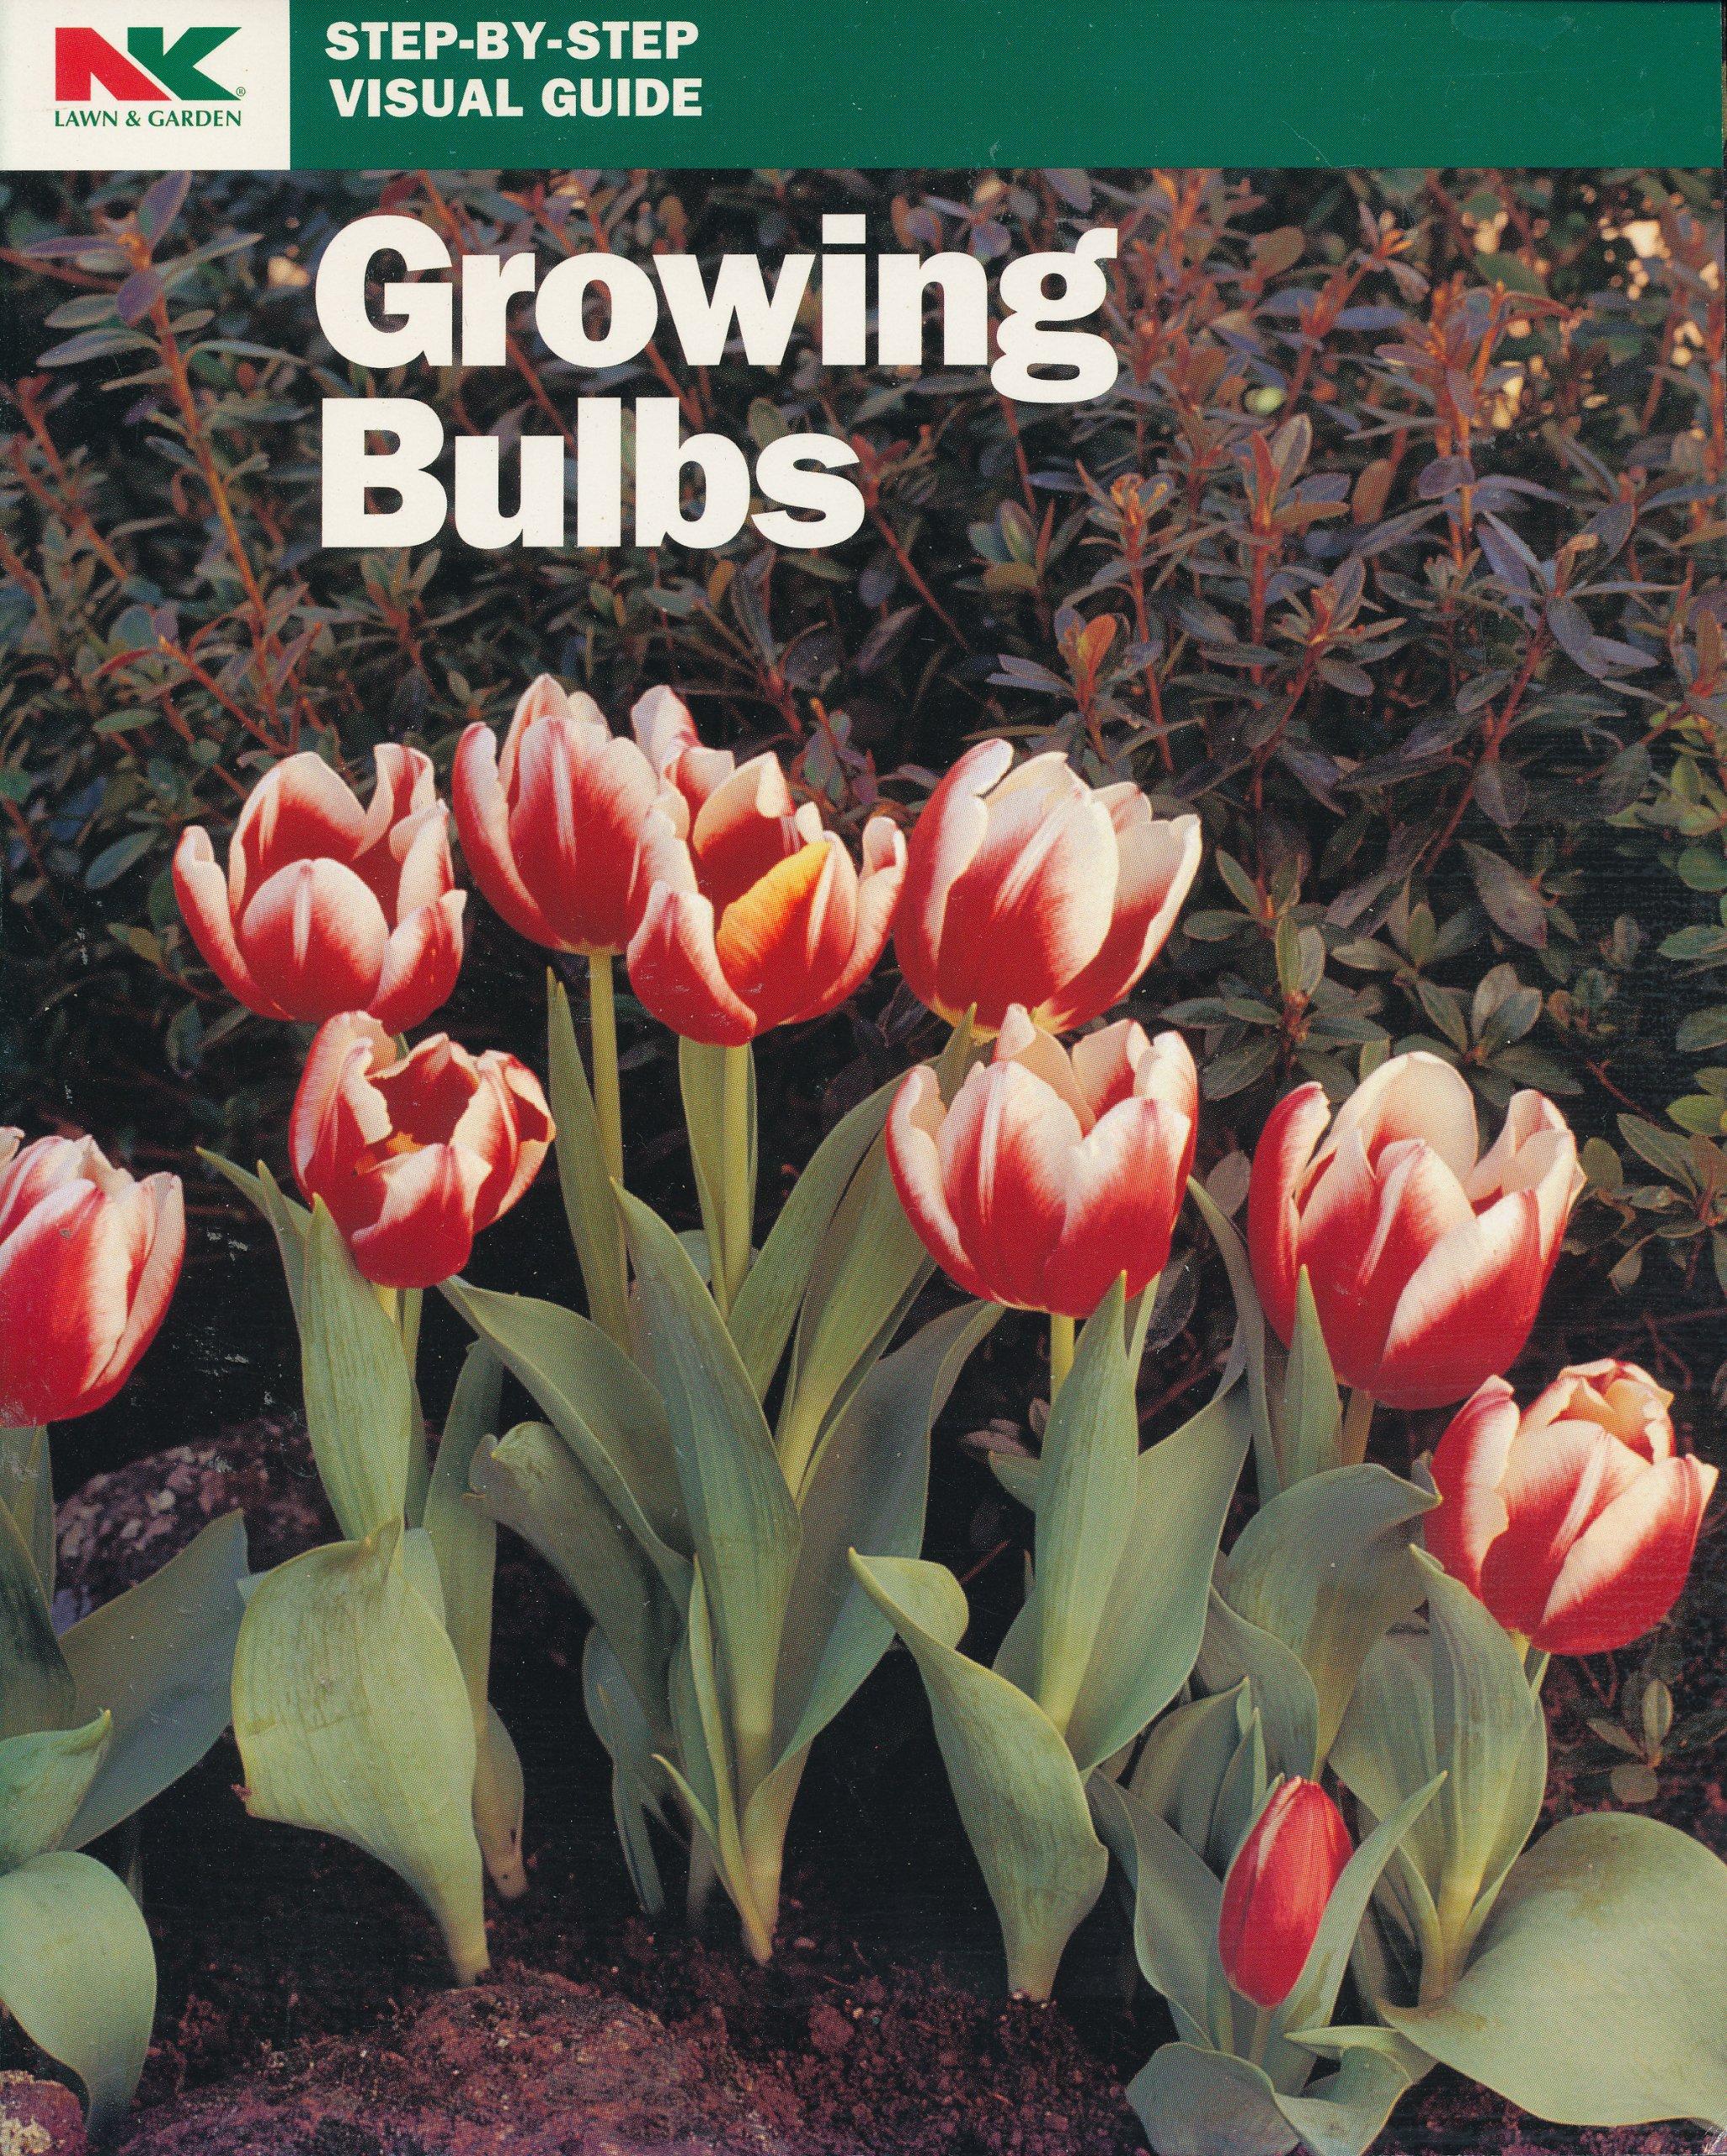 Growing Bulbs (Step-By-Step Visual Guide)